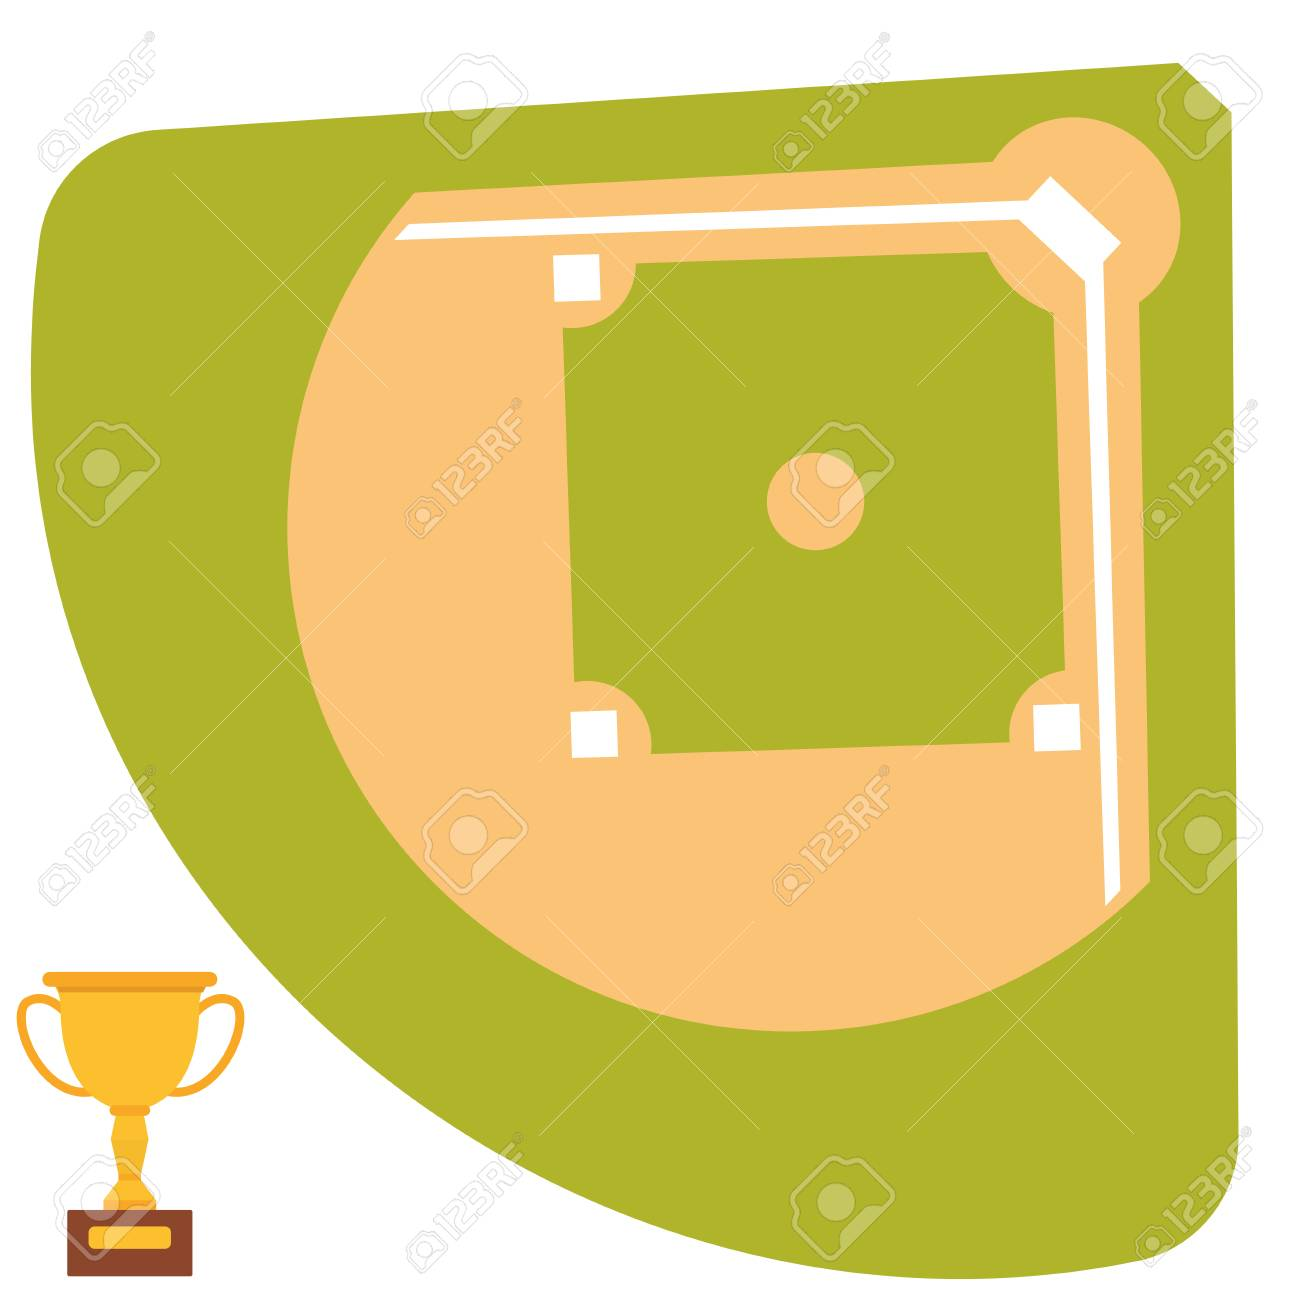 baseball field cartoon icon batting design american game athlete rh 123rf com baseball field cartoon drawing Cartoon Baseball Player